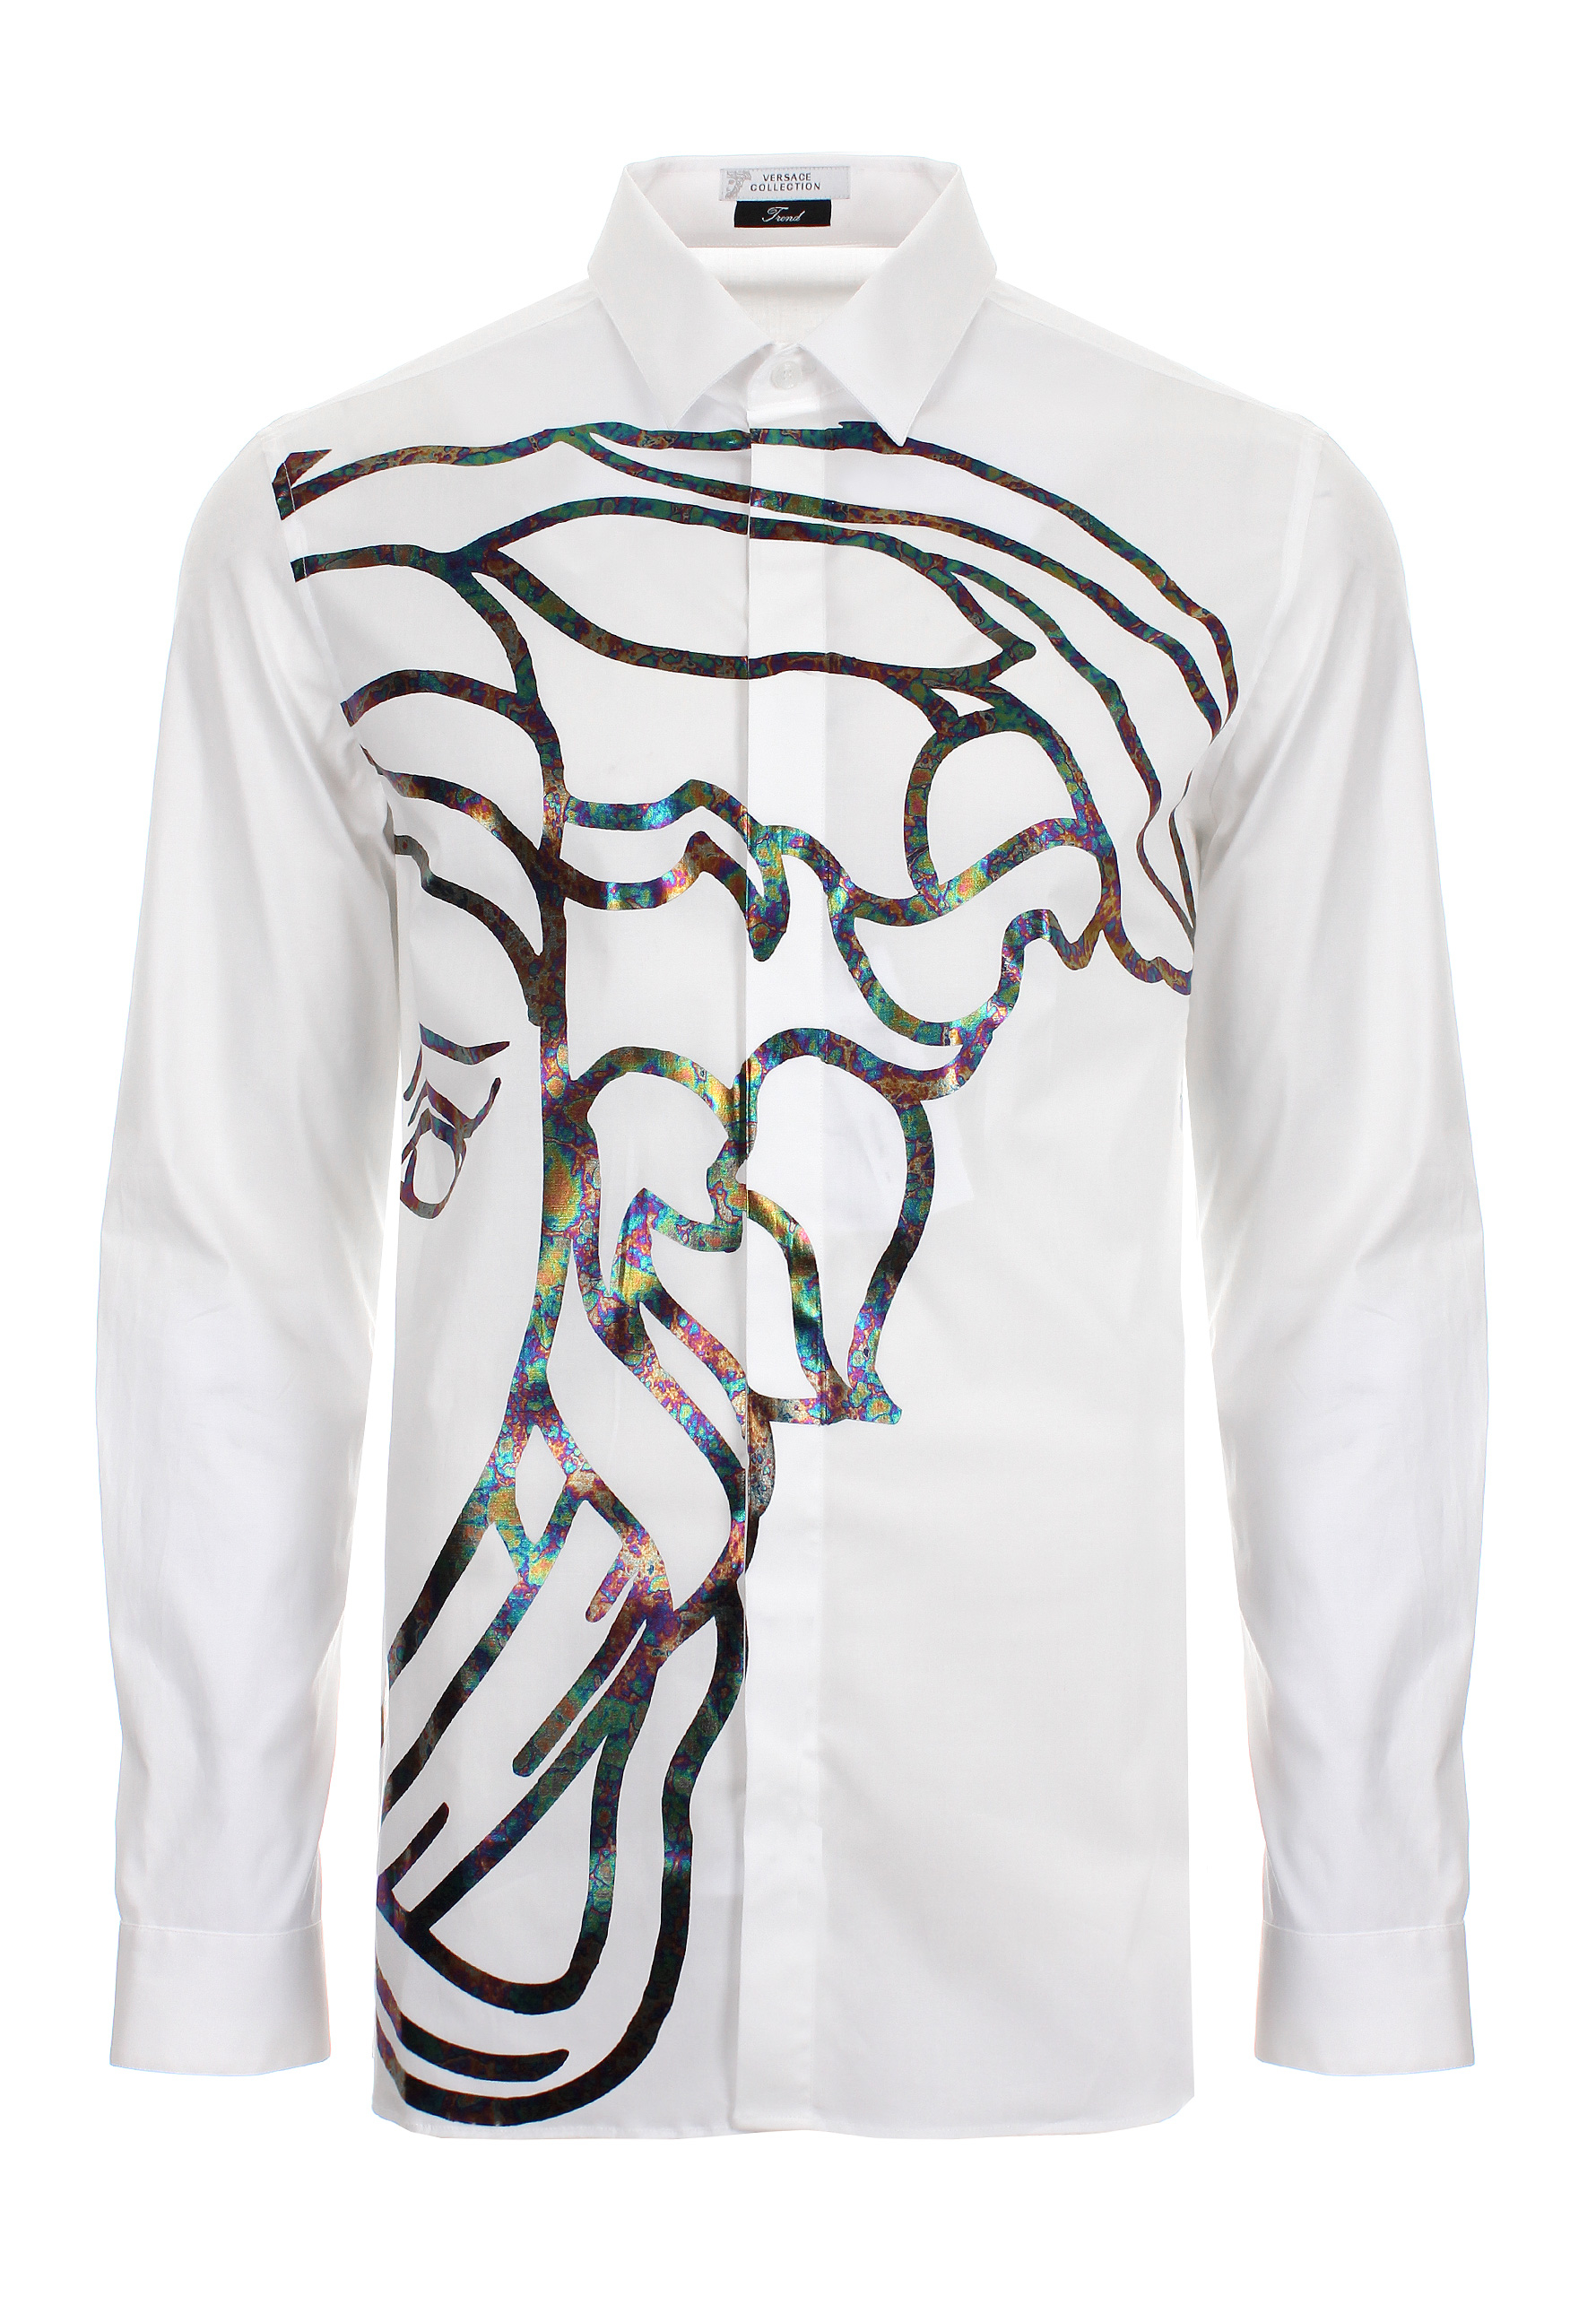 Versace Collection Caviar Medusa T Shirt White - J9531